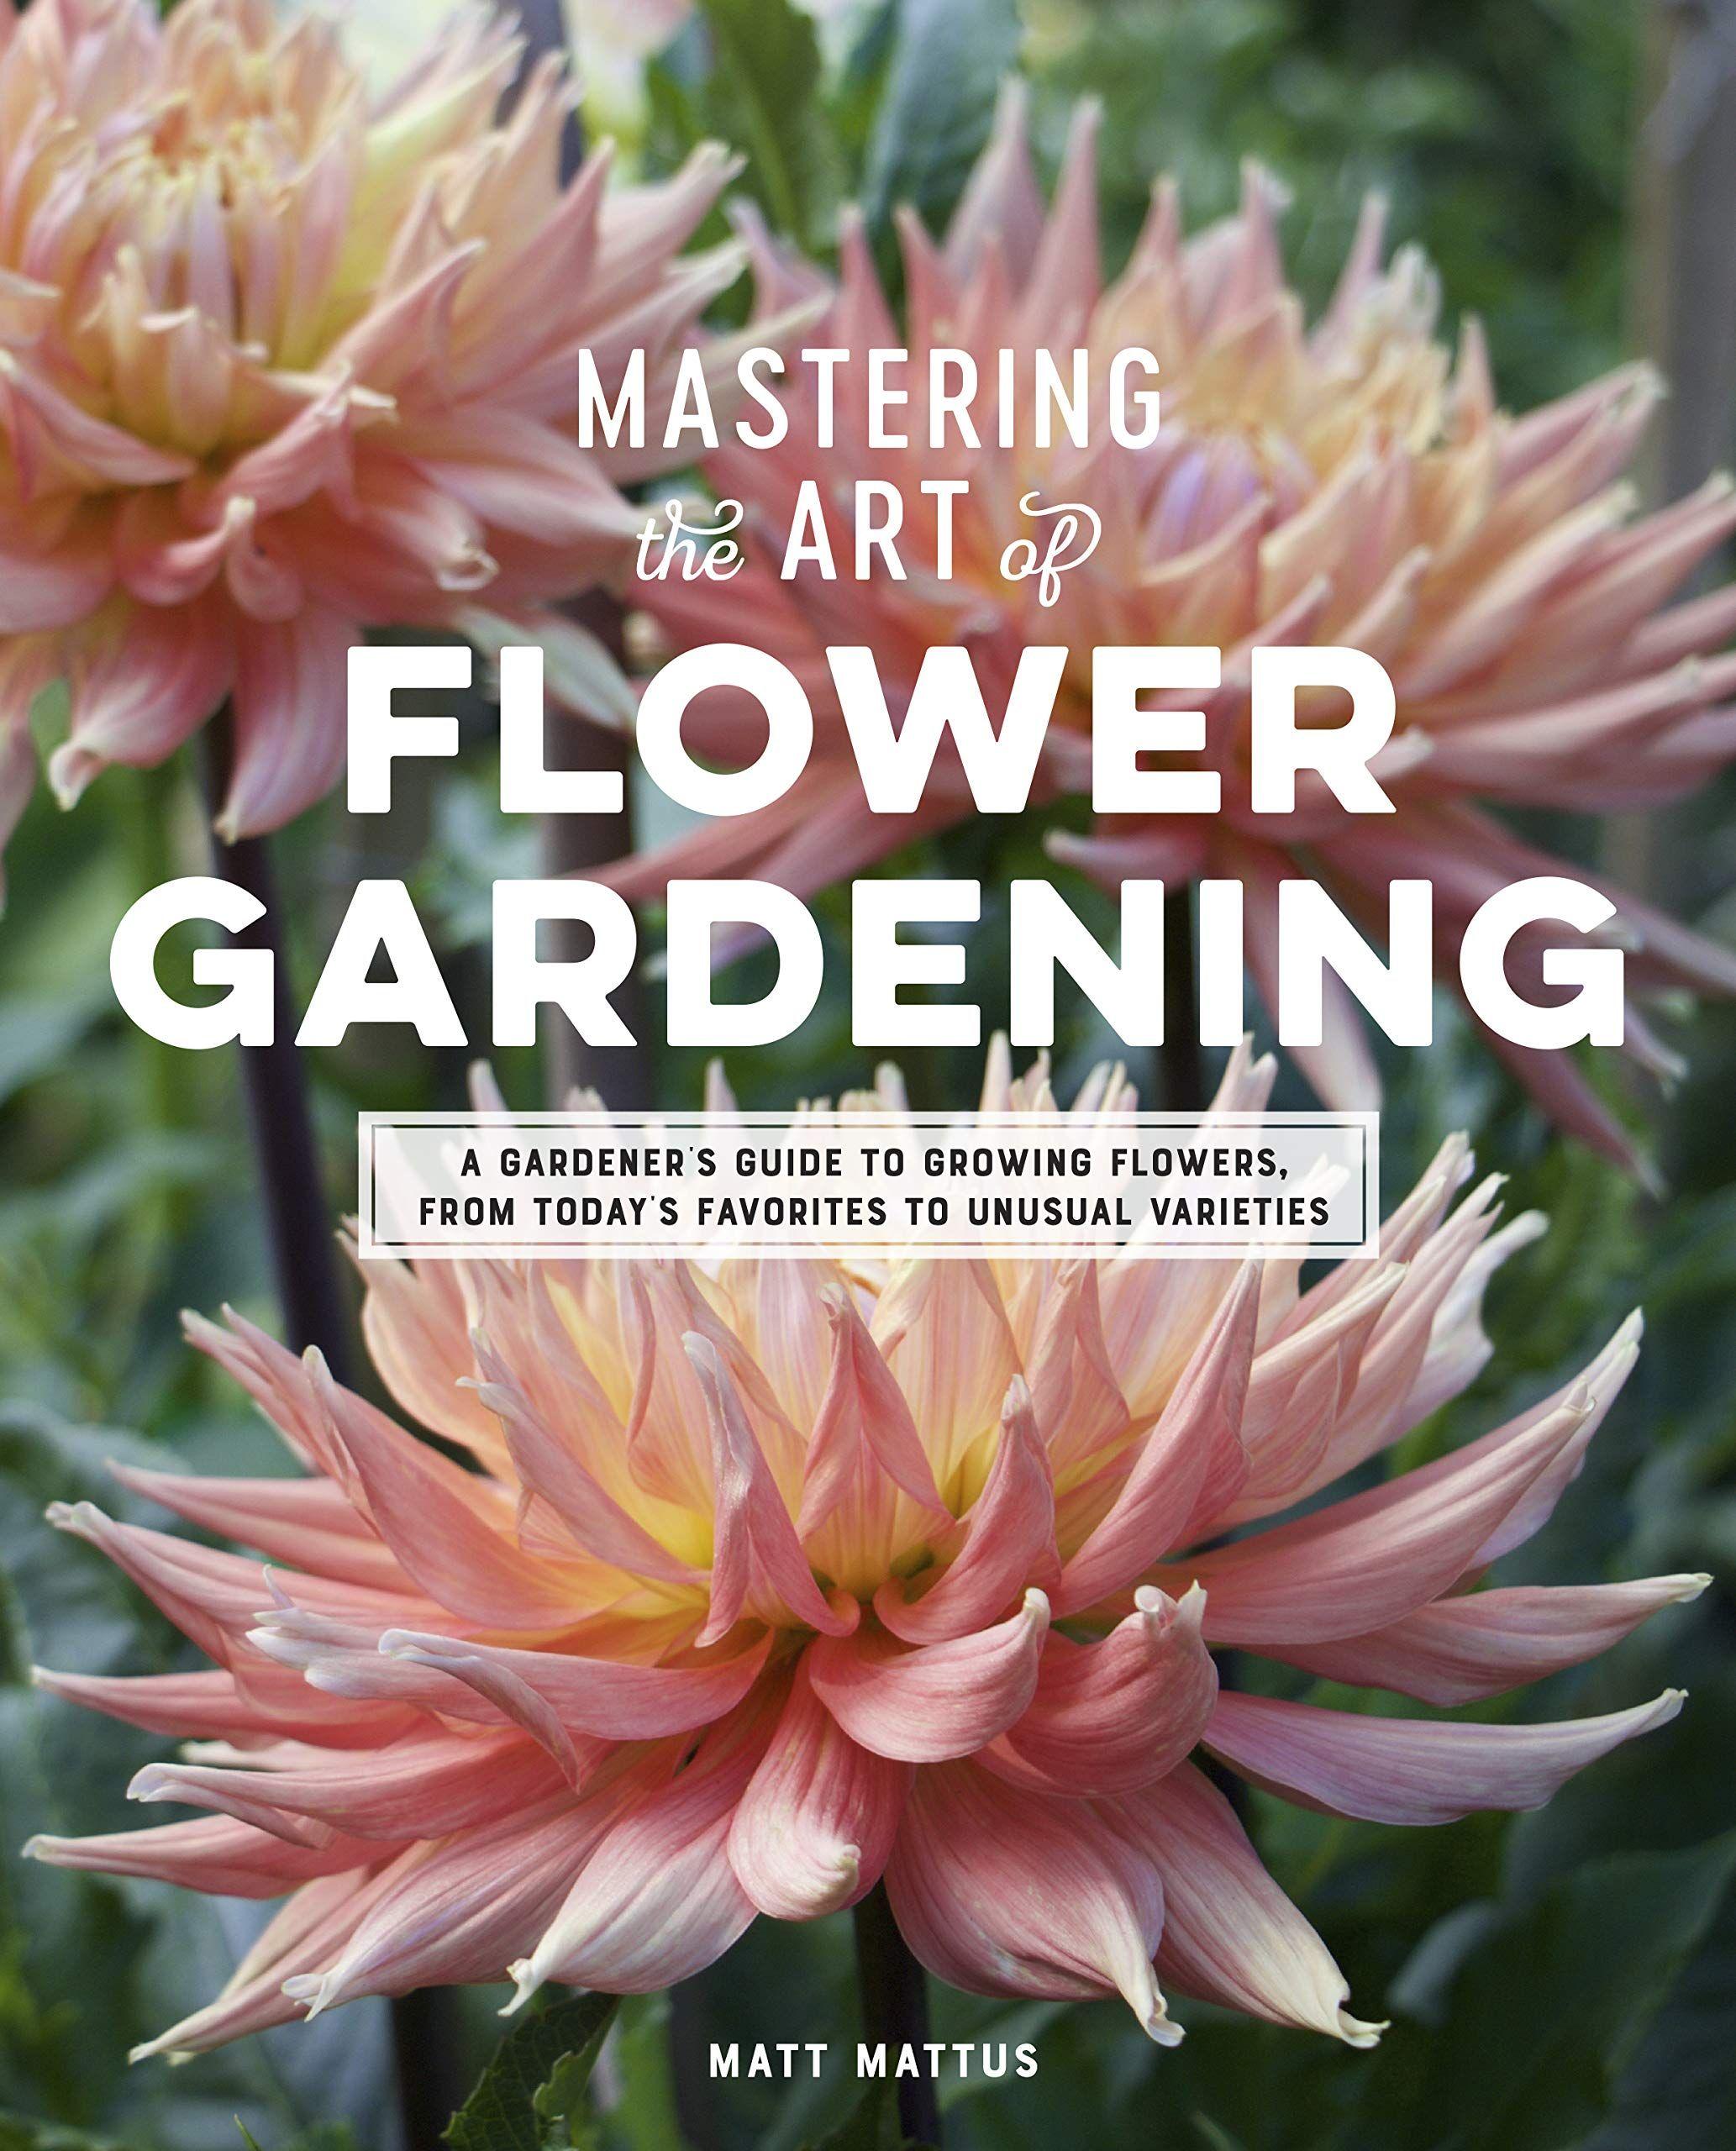 Mastering the Art of Flower Gardening by Matt Mattus